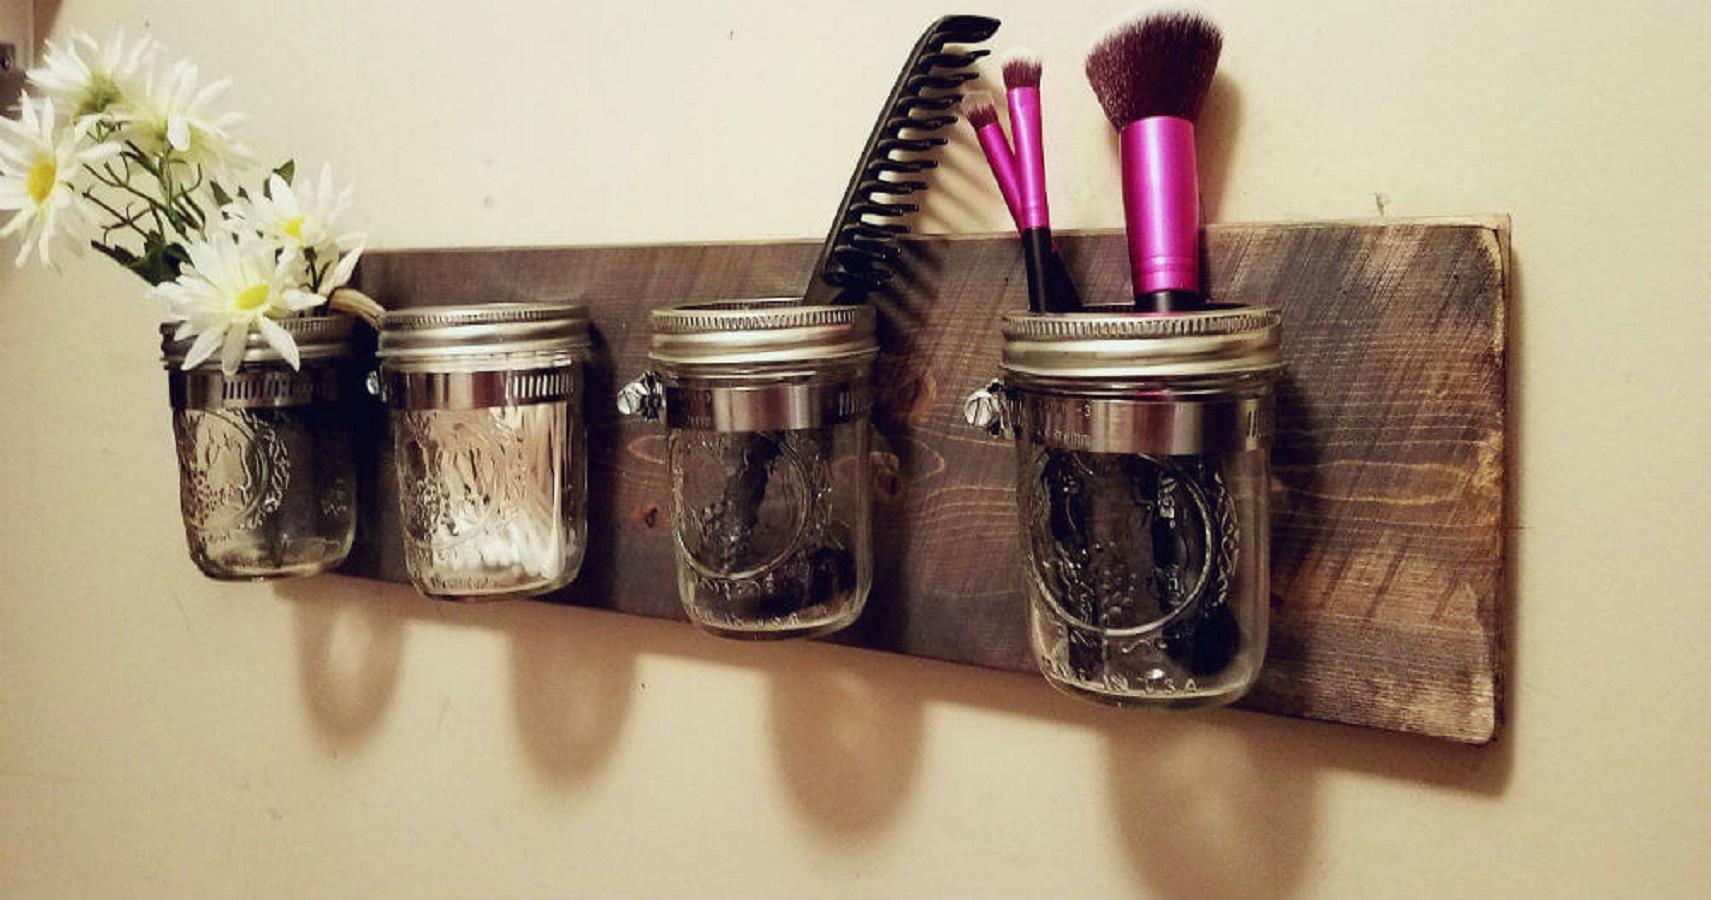 Tees transformations mason jar organizer https://homebnc.com/best-etsy-bathroom-accessories-ideas-to-buy/